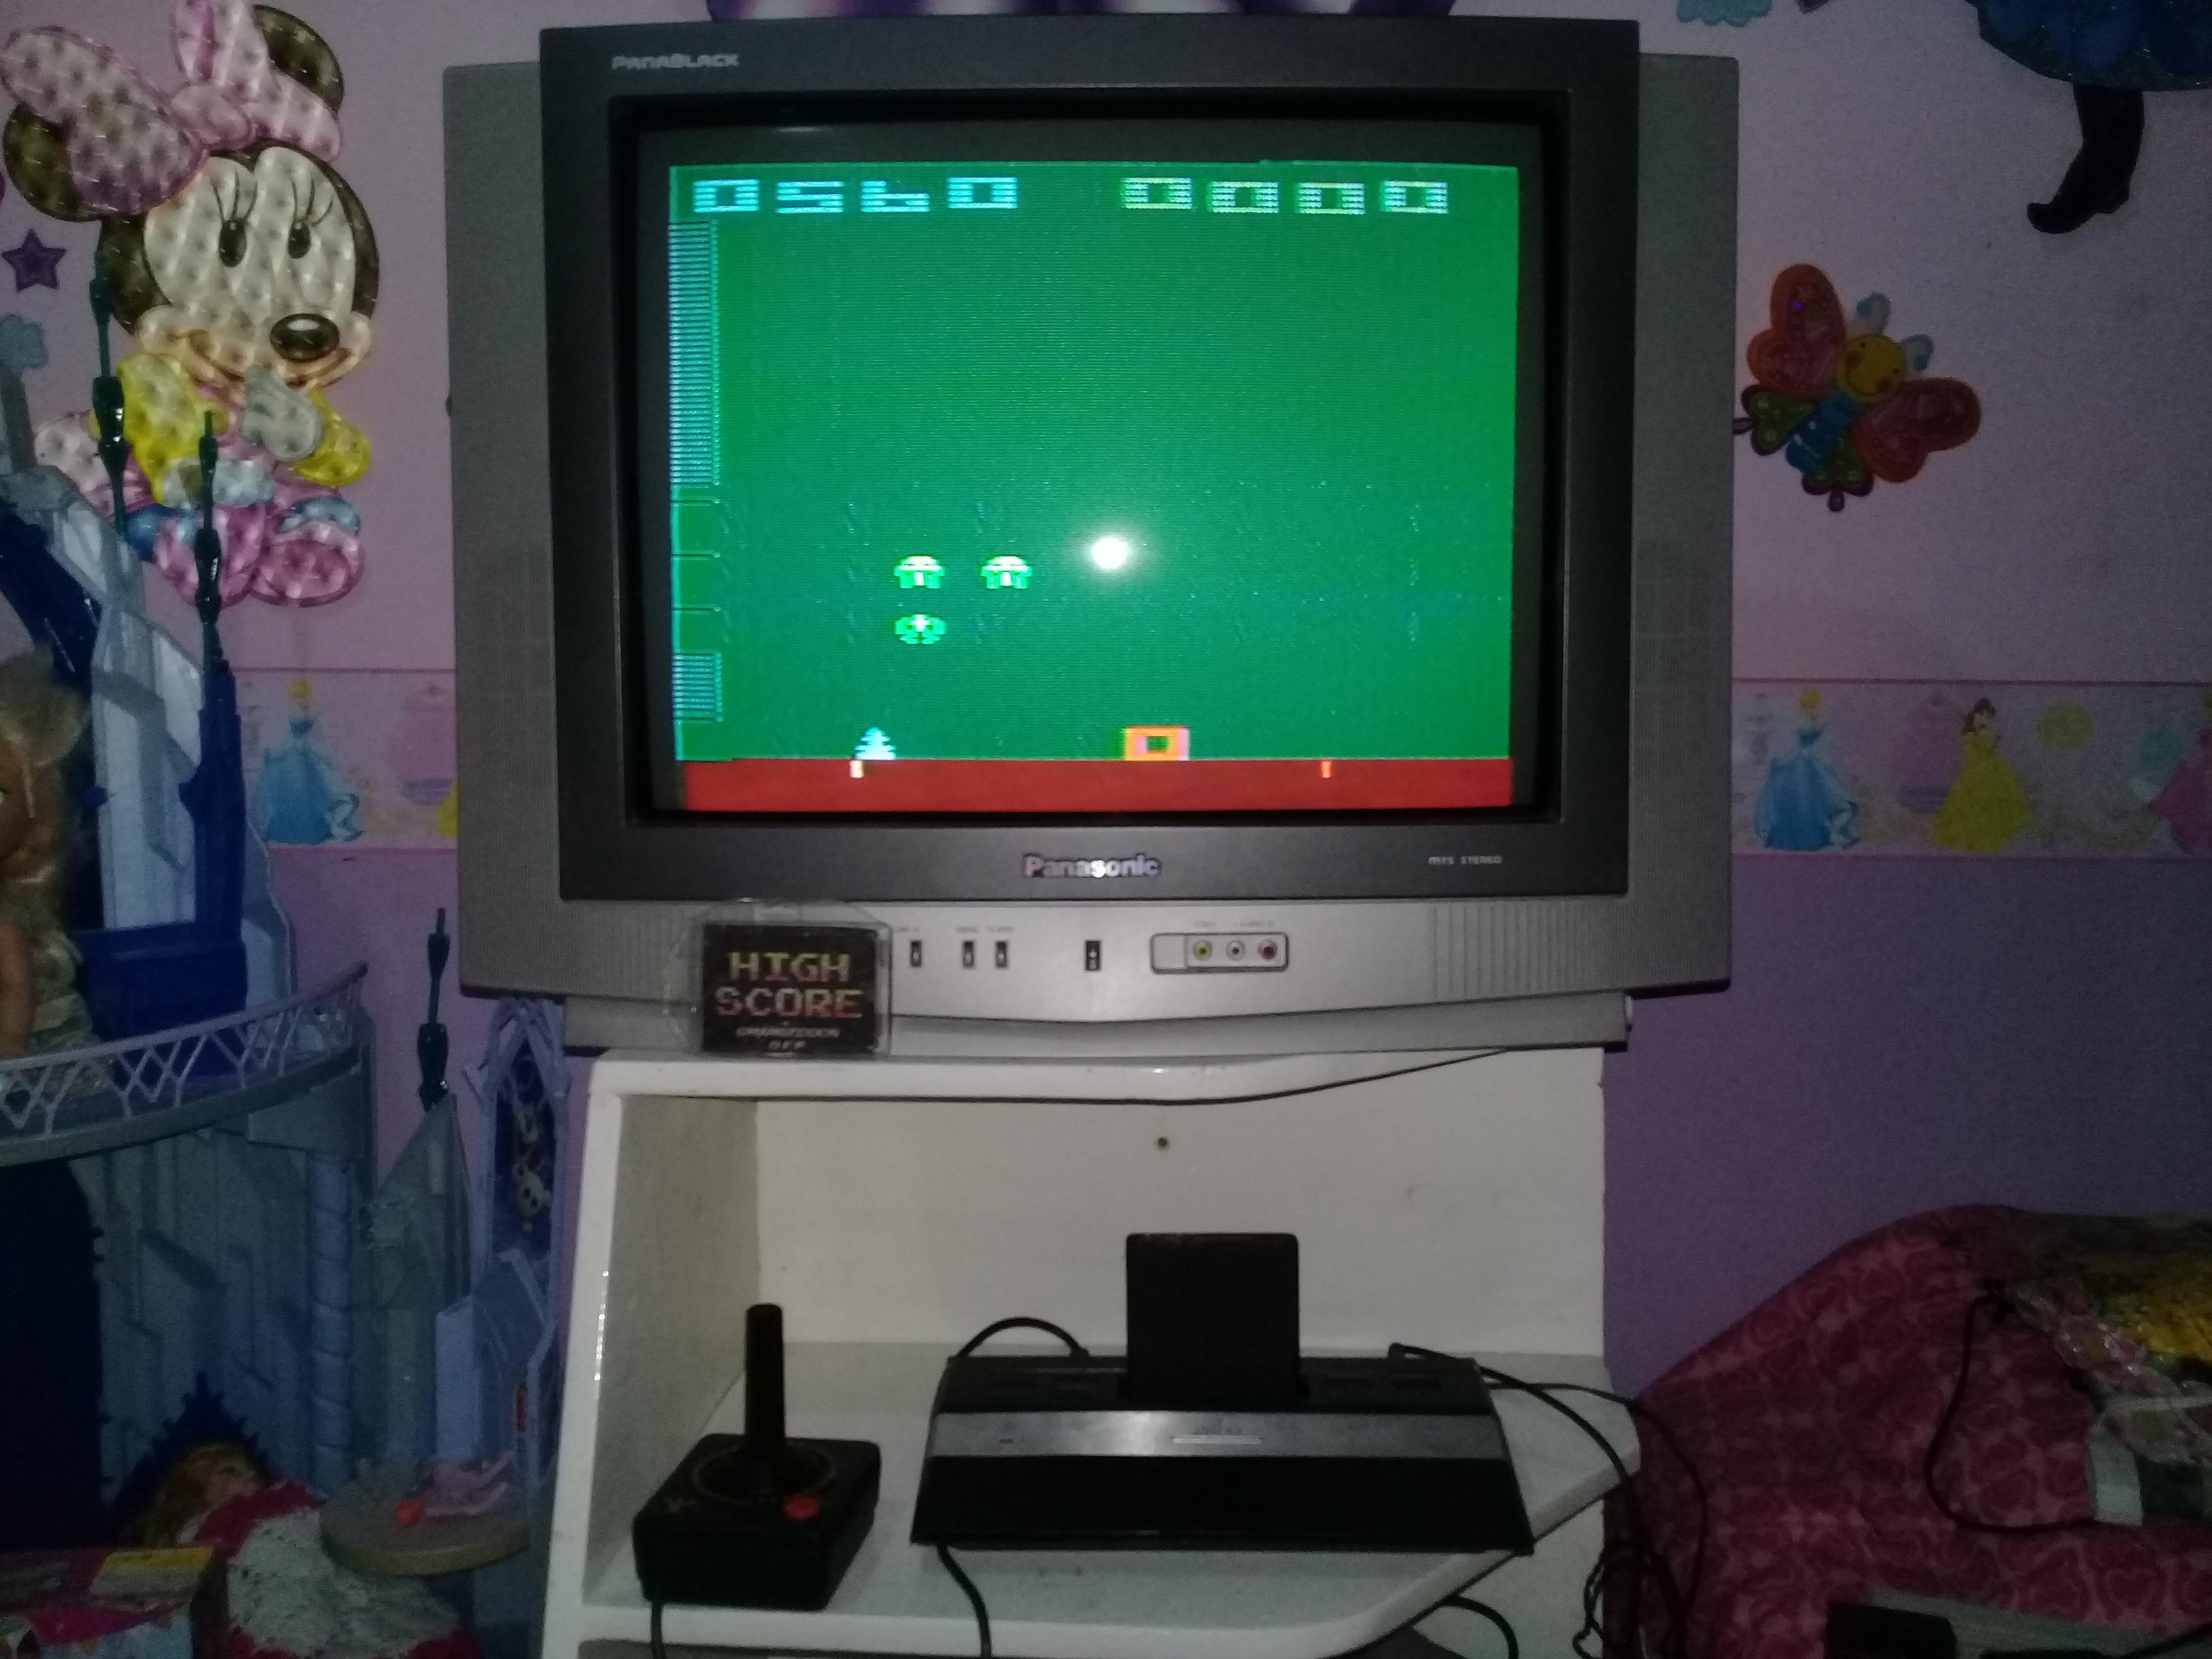 omargeddon: Space Invaders: Game 14 (Atari 2600 Novice/B) 560 points on 2019-05-22 20:23:48